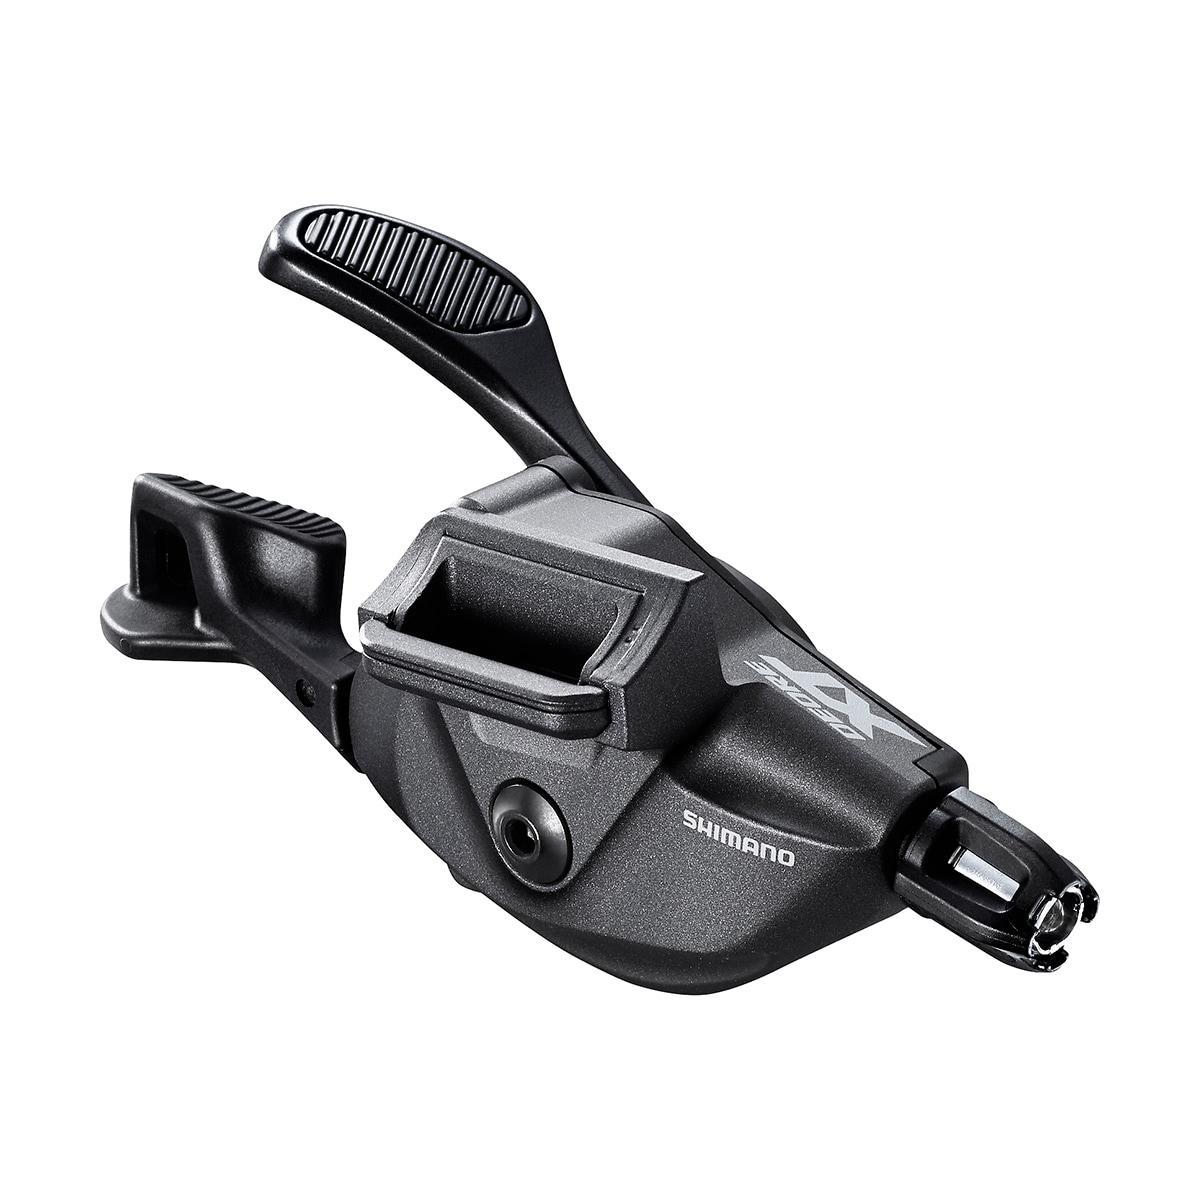 Shimano Växelreglage, Rapidfire Plus M8100-I, I-SPEC EV